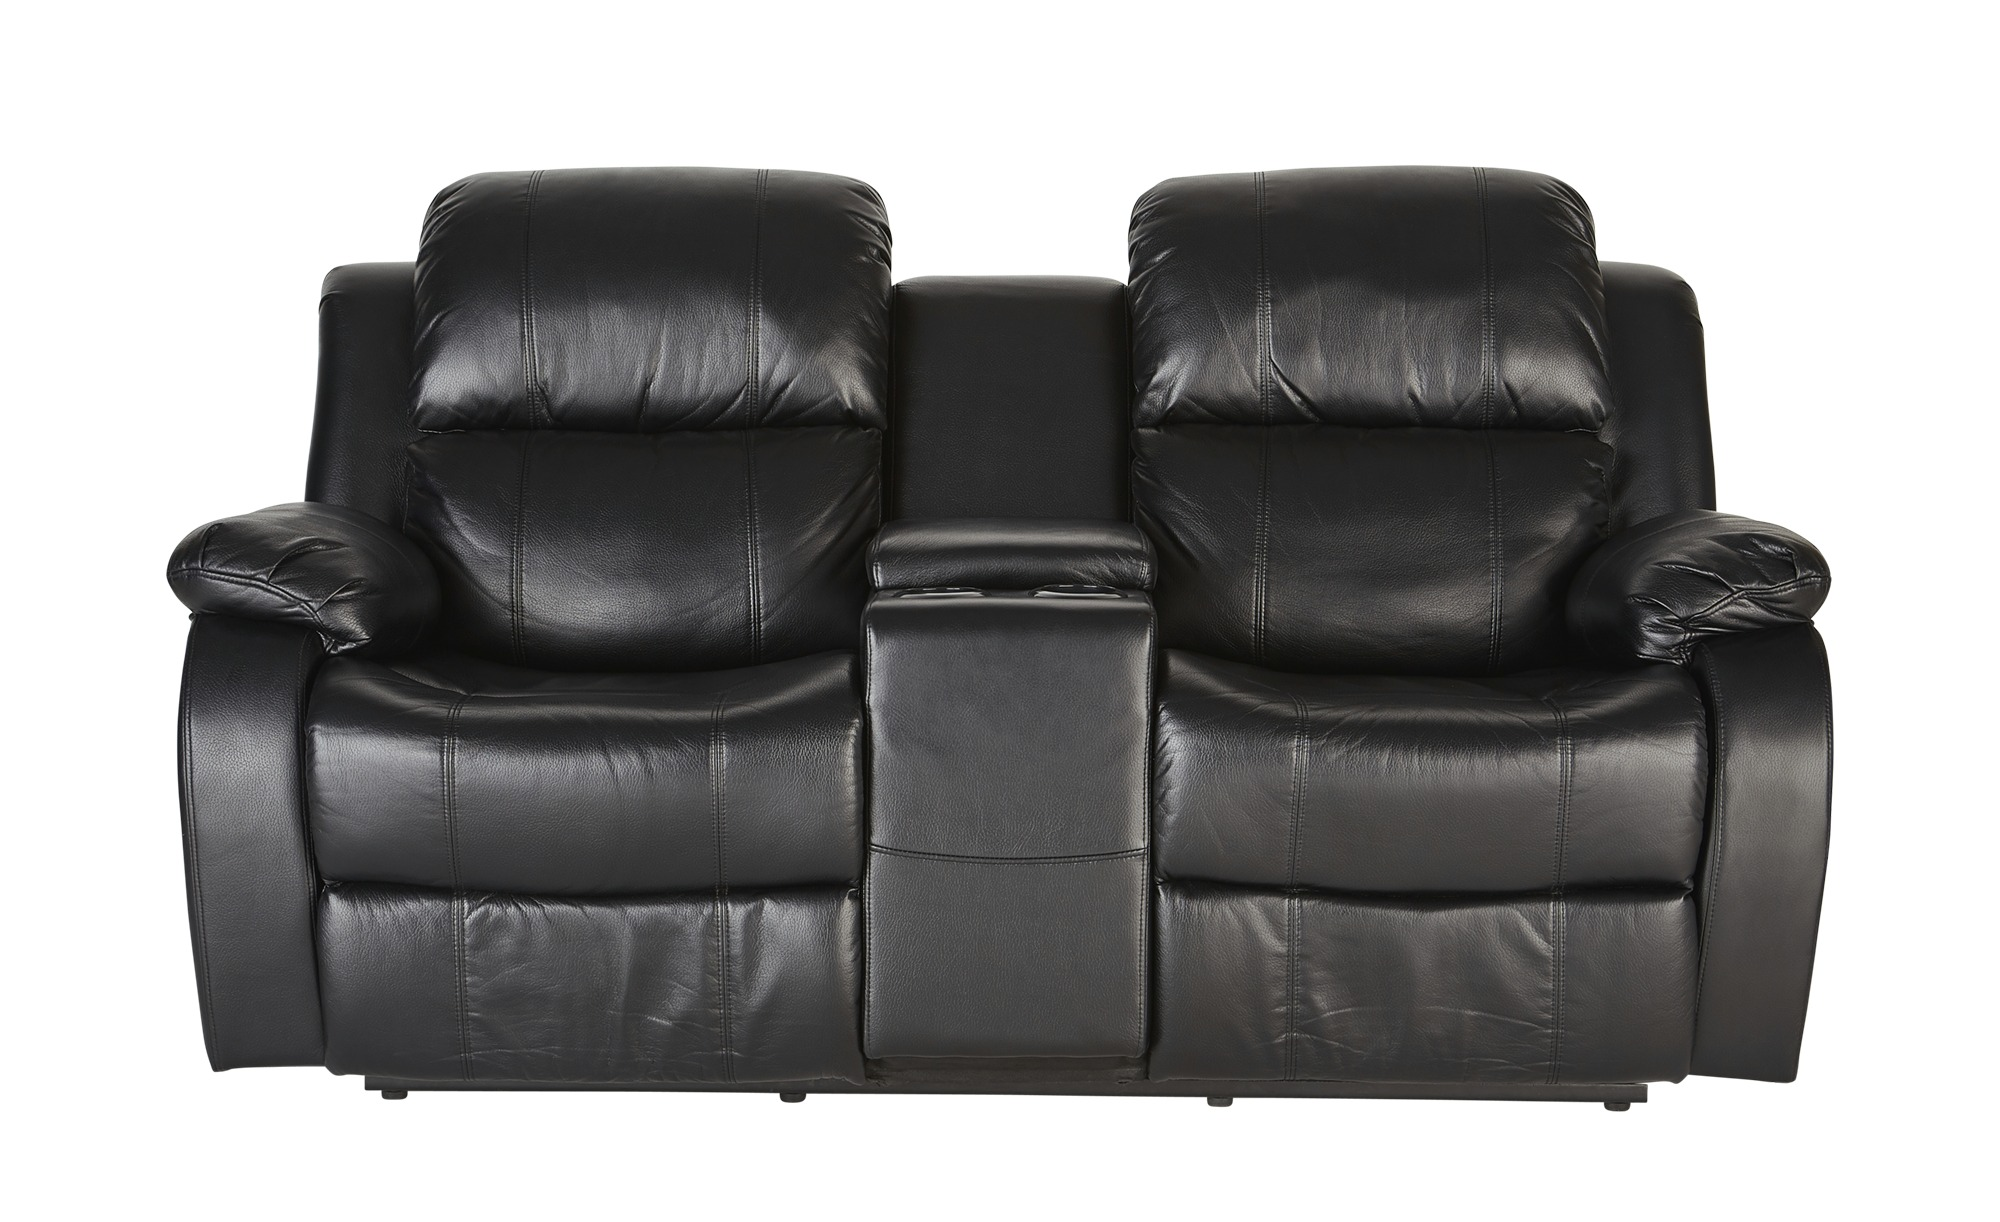 2-Sitzer Schwarz - schwarz - Sconto